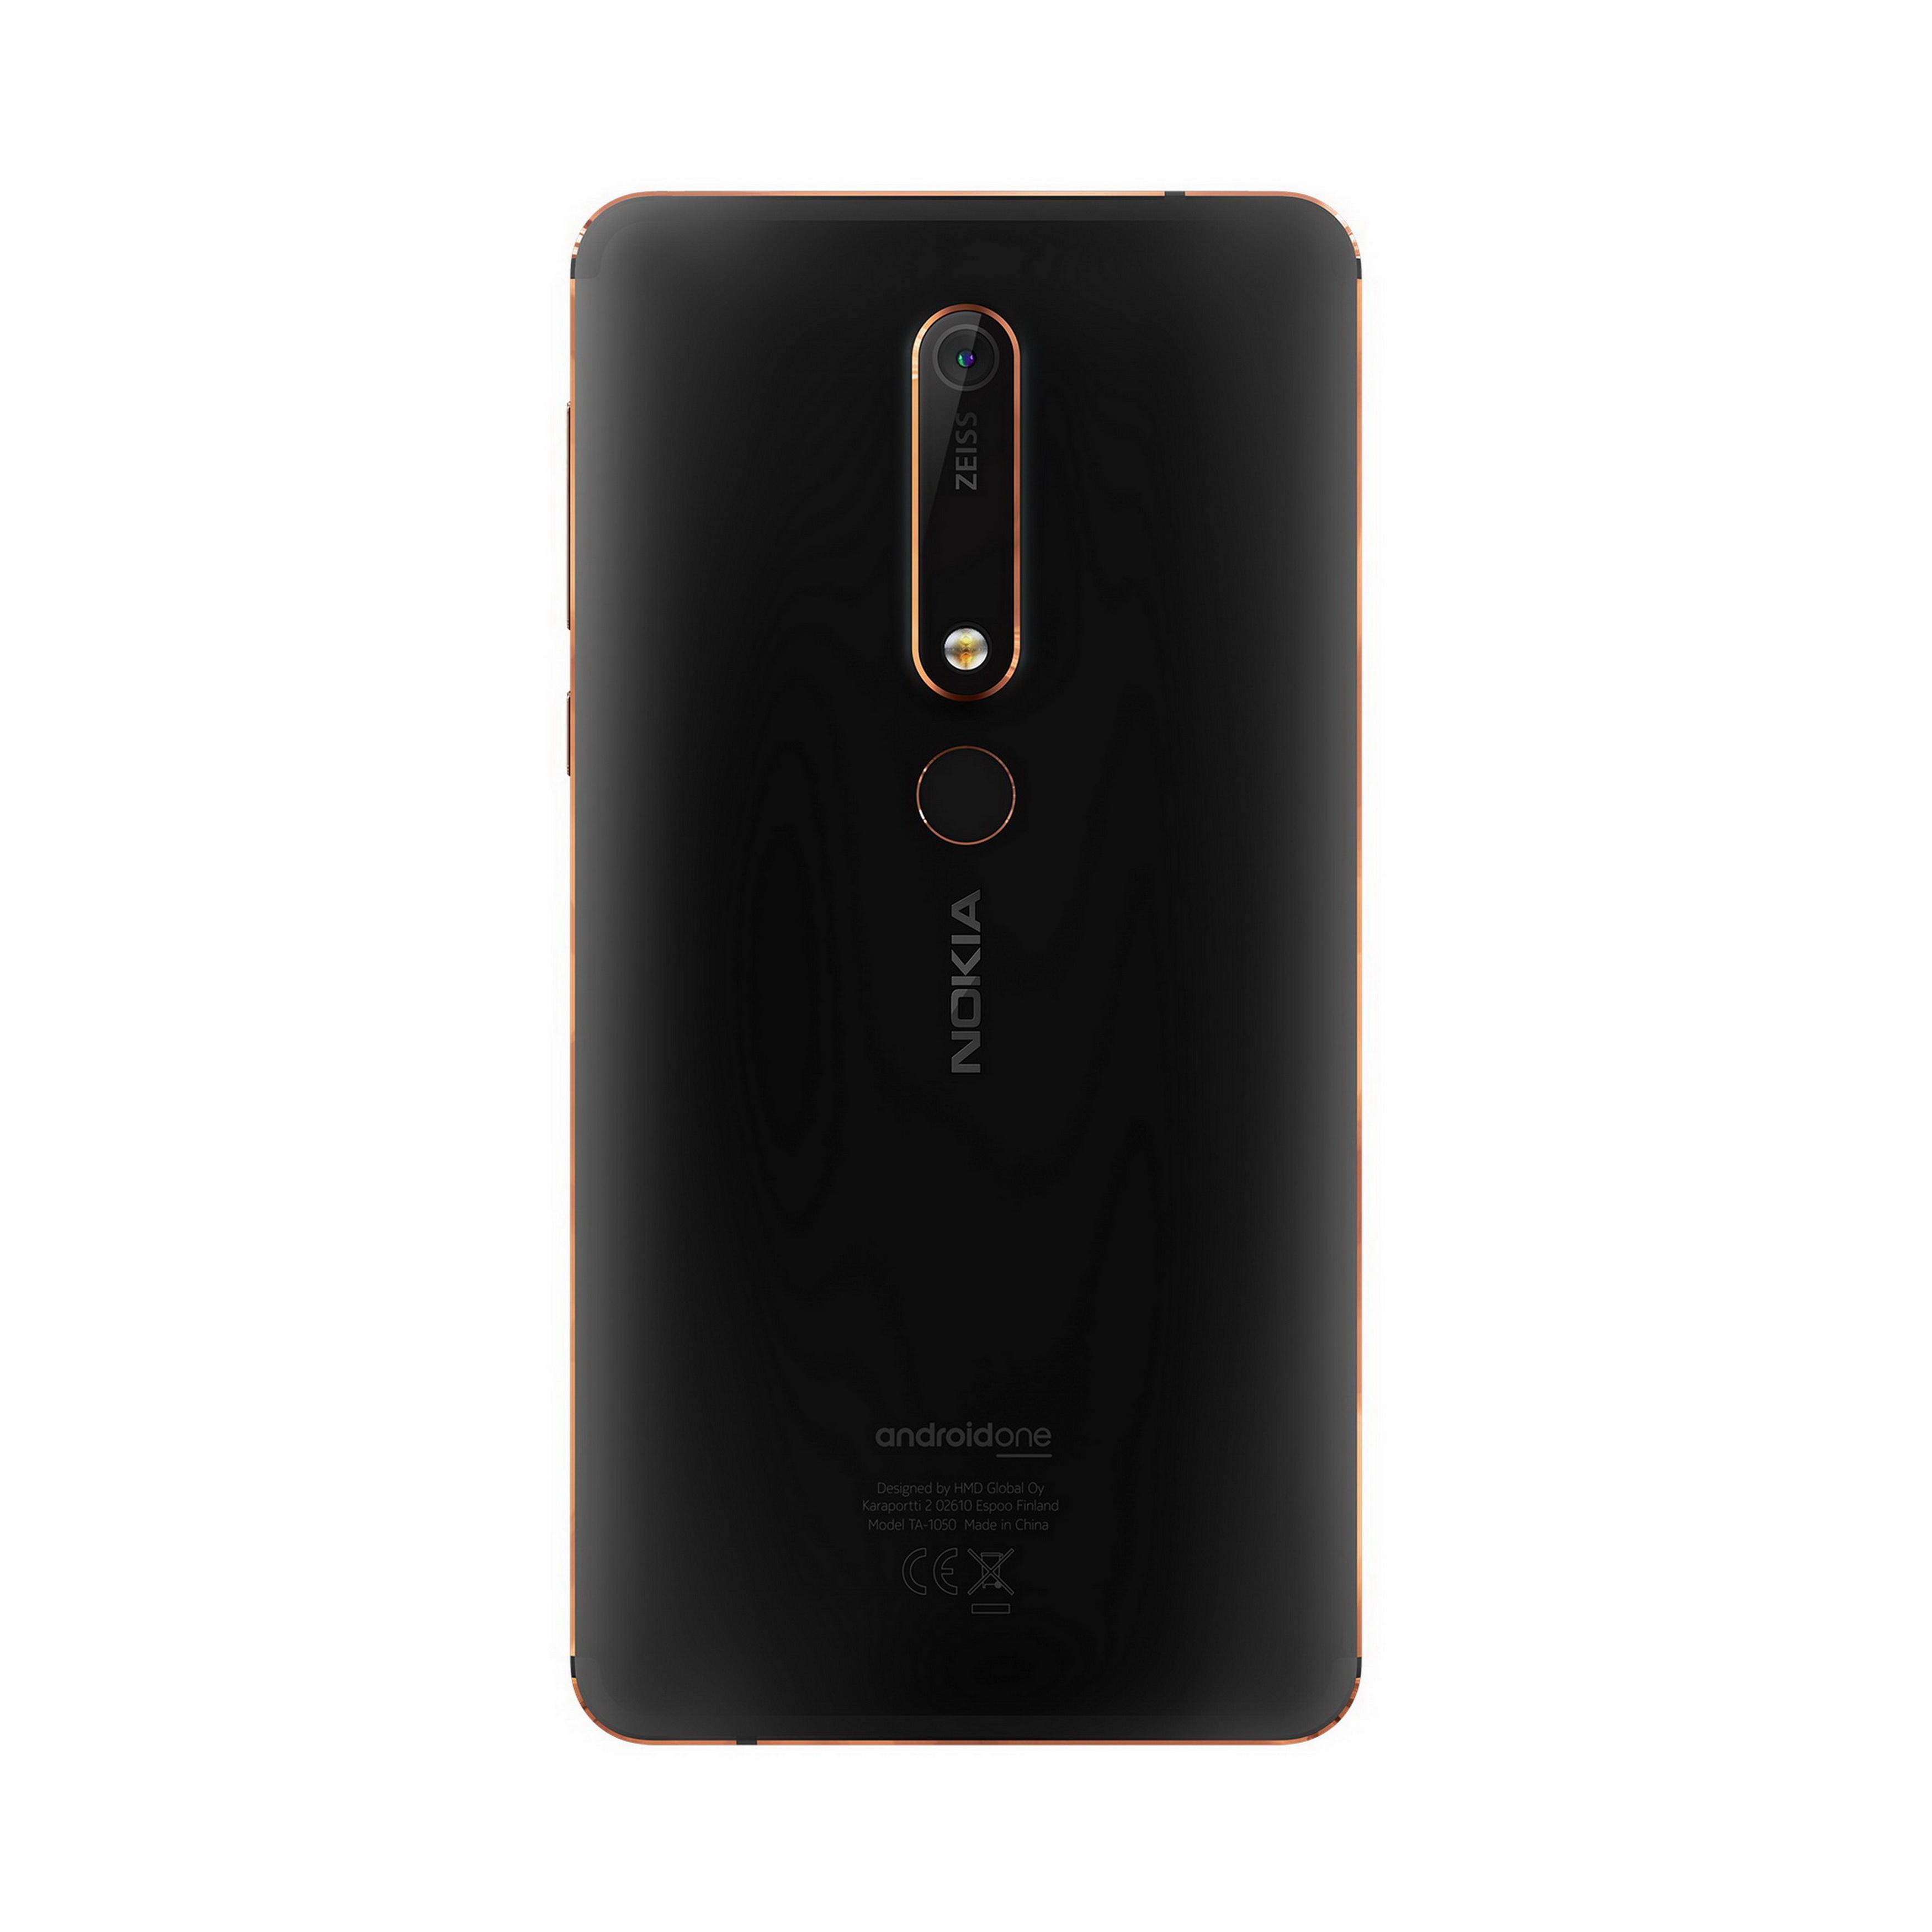 04 HMD_New Nokia6_ROW BlackCopper